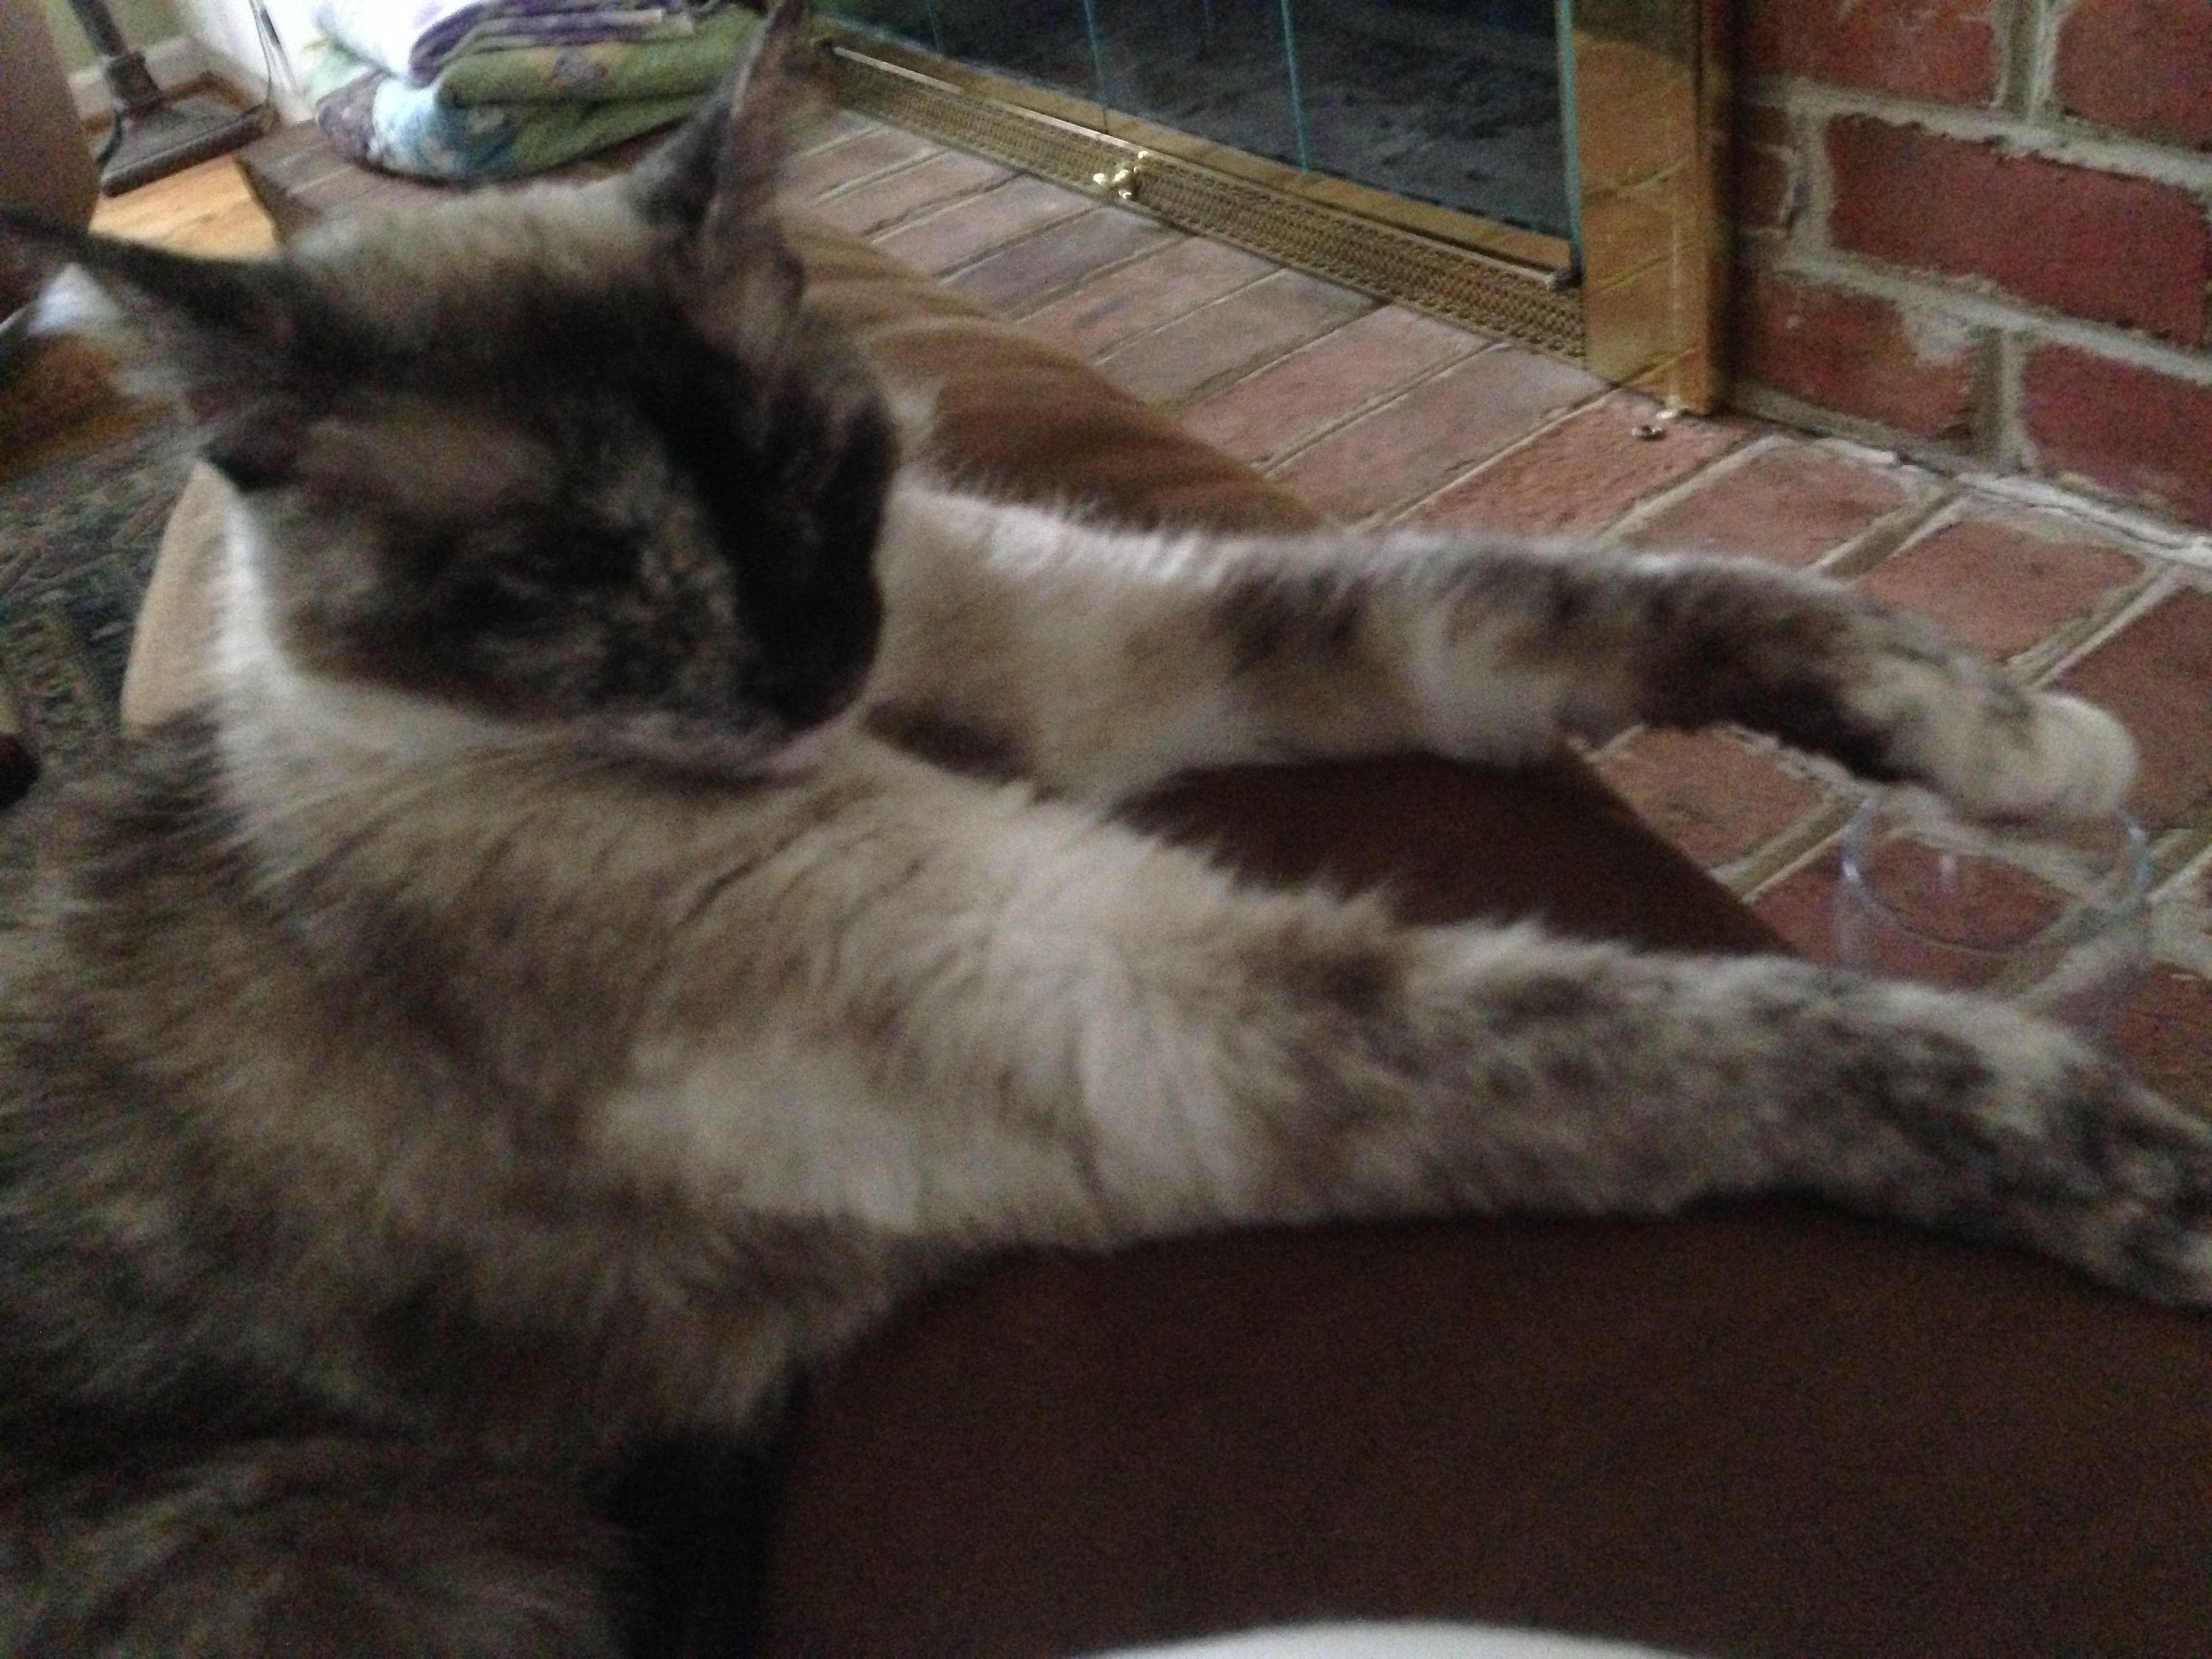 Mrs. Schma. My lazy kitty. Tortoiseshell point Siamese mix